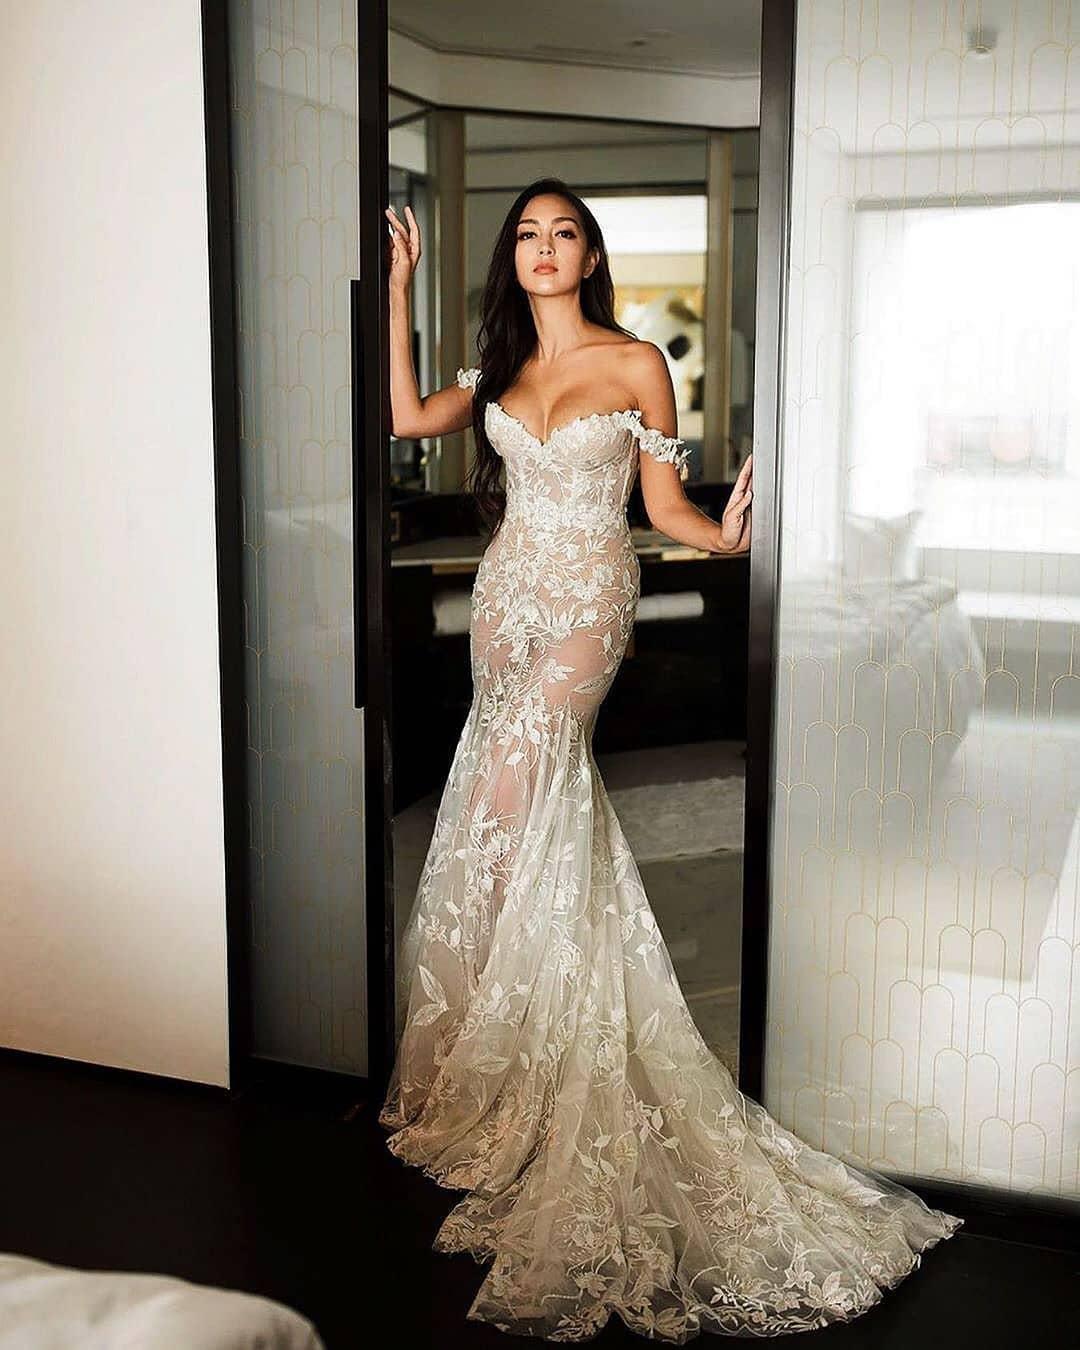 Amazing Dress 4Dresses Galialahav - Weddings